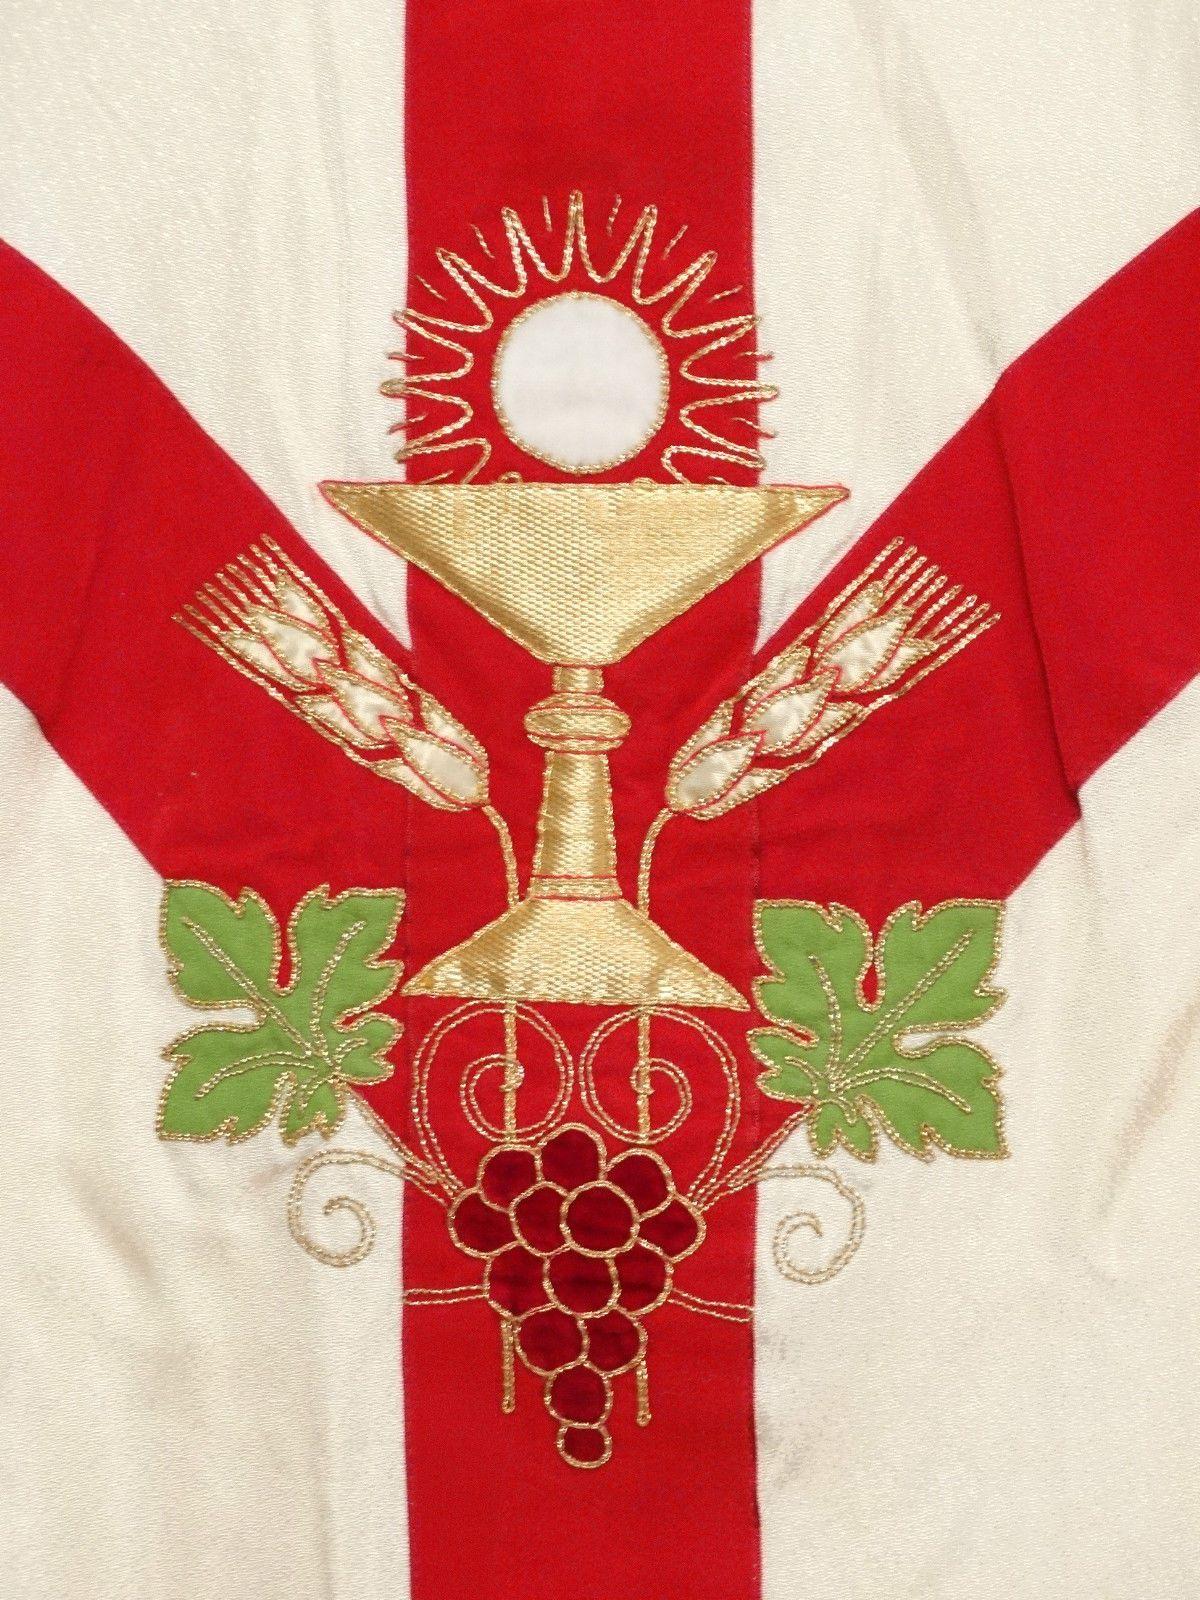 Catholic French Gothic Chasuble Chalice Motif Altar White Vestment Stole 1 Ebay Chalice Church Banners Vestment